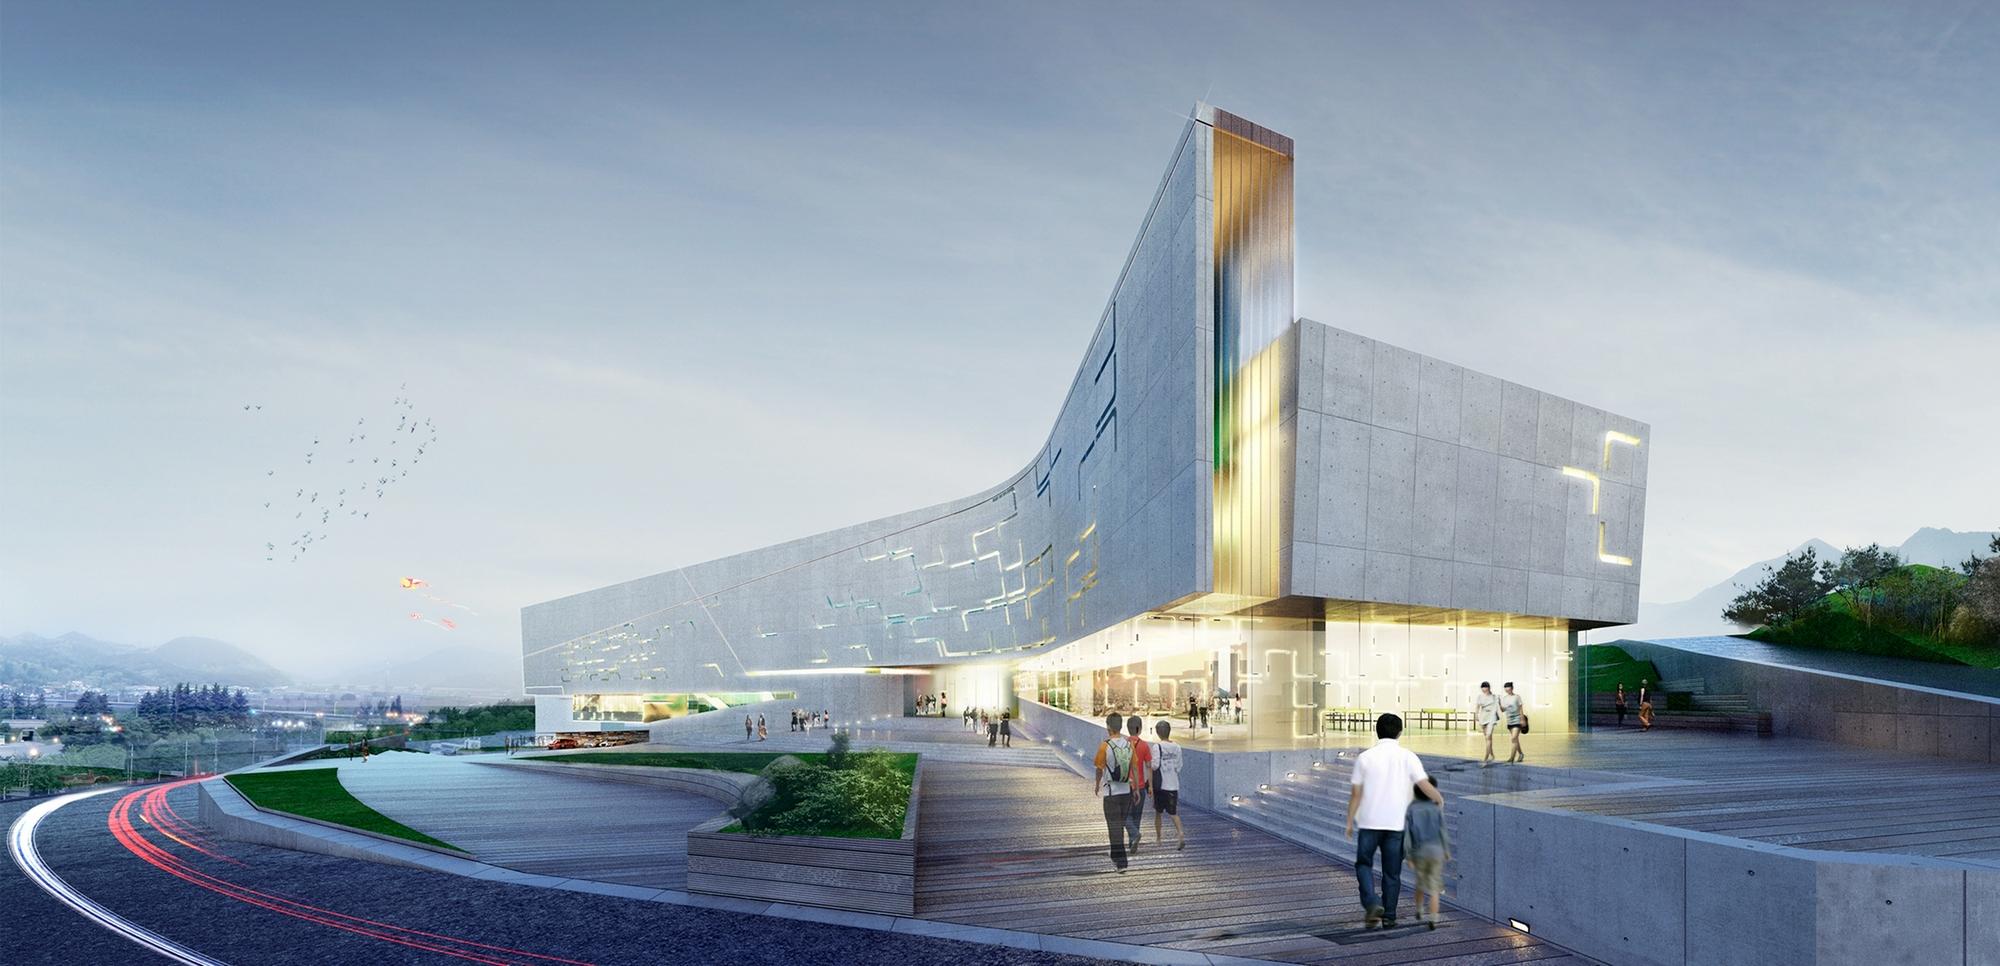 sports complex project for the daegugun region daegu